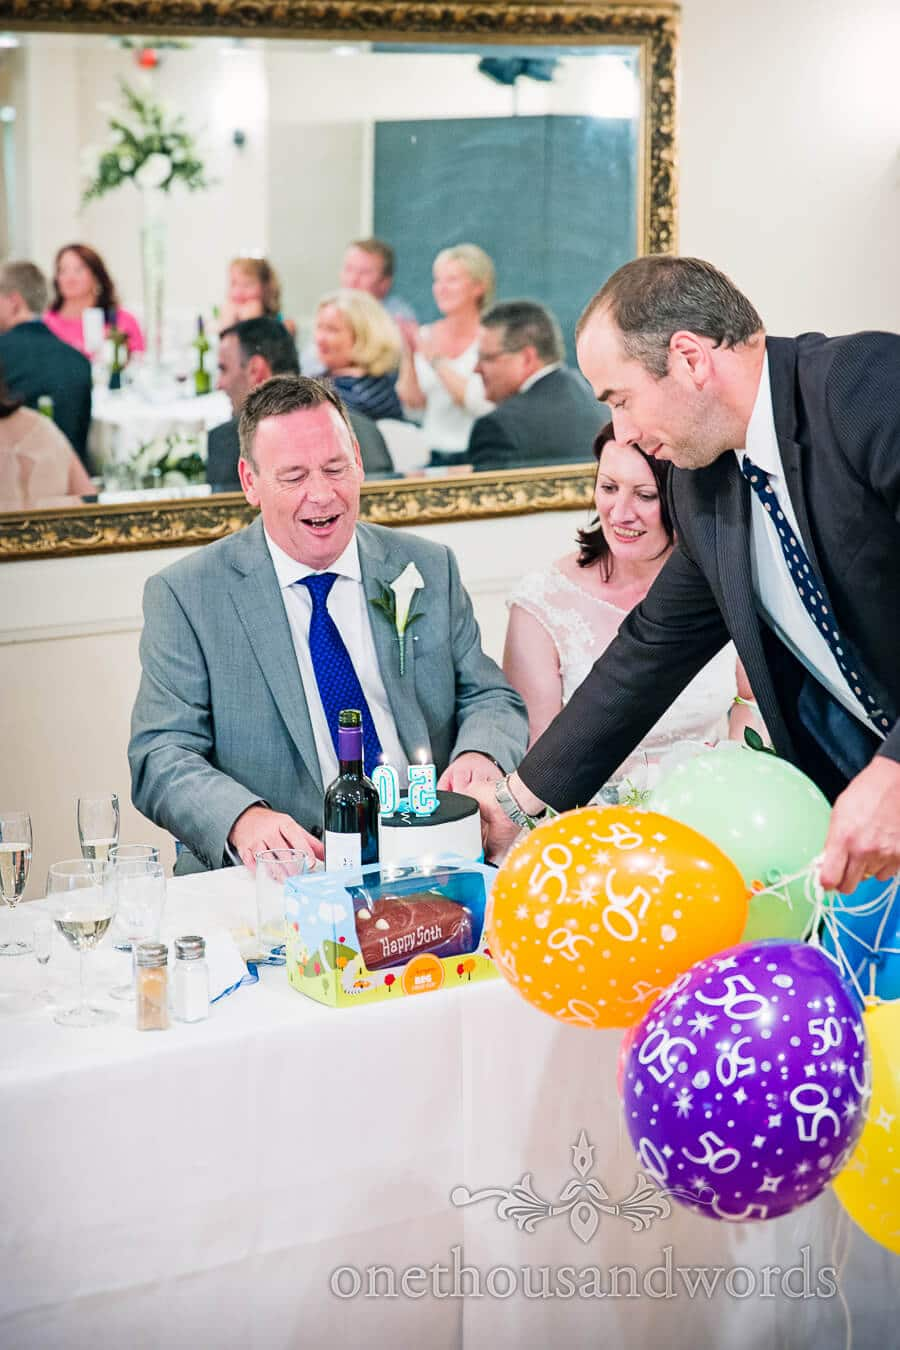 Birthday cake at Salterns Hotel Wedding breakfast